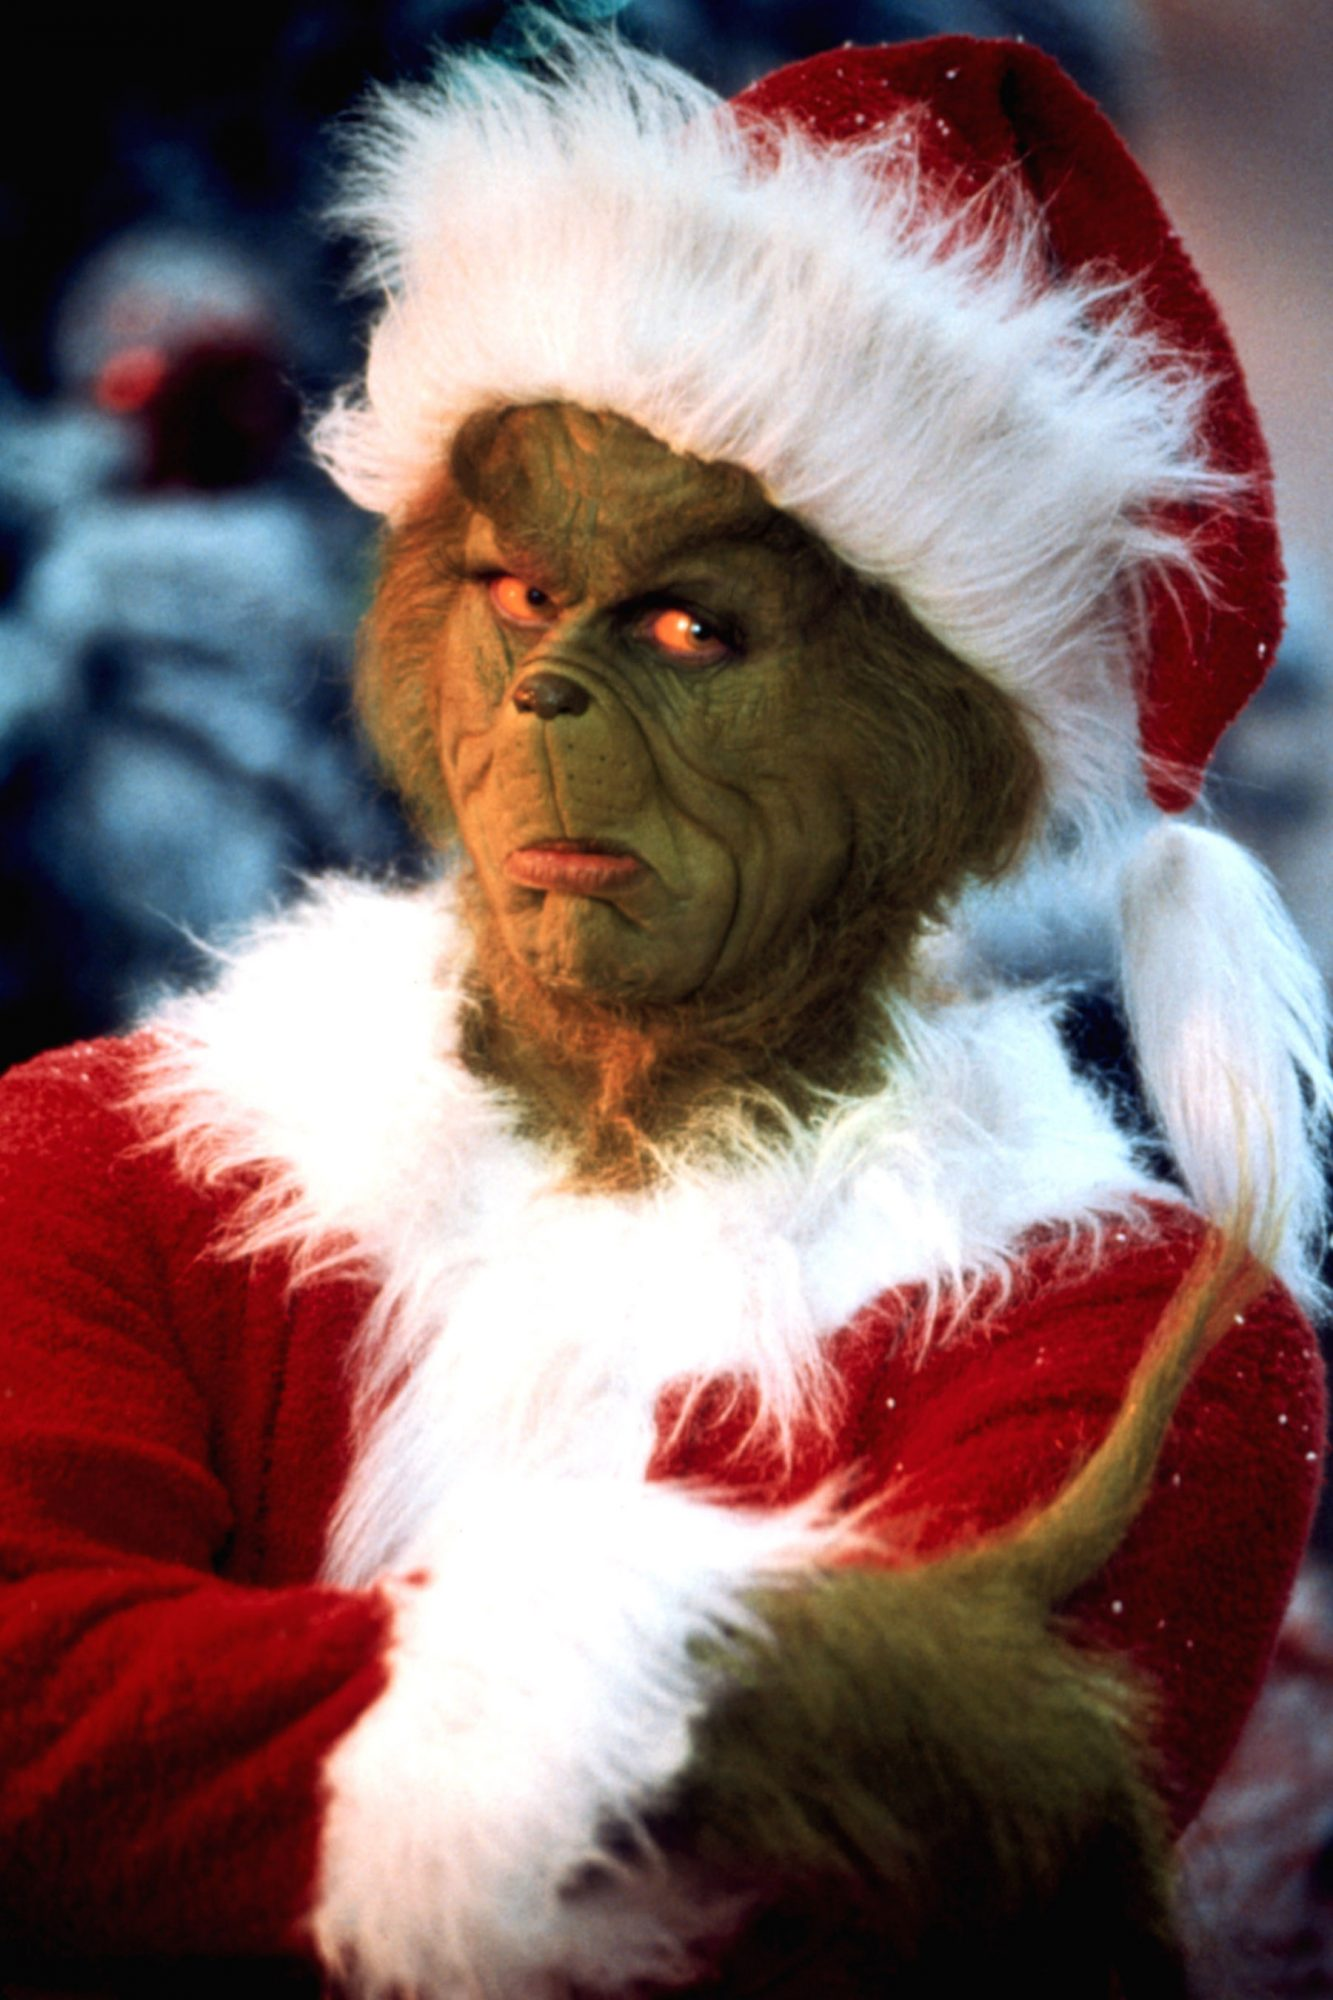 DR. SEUSS' HOW THE GRINCH STOLE CHRISTMAS, Jim Carrey, 2000